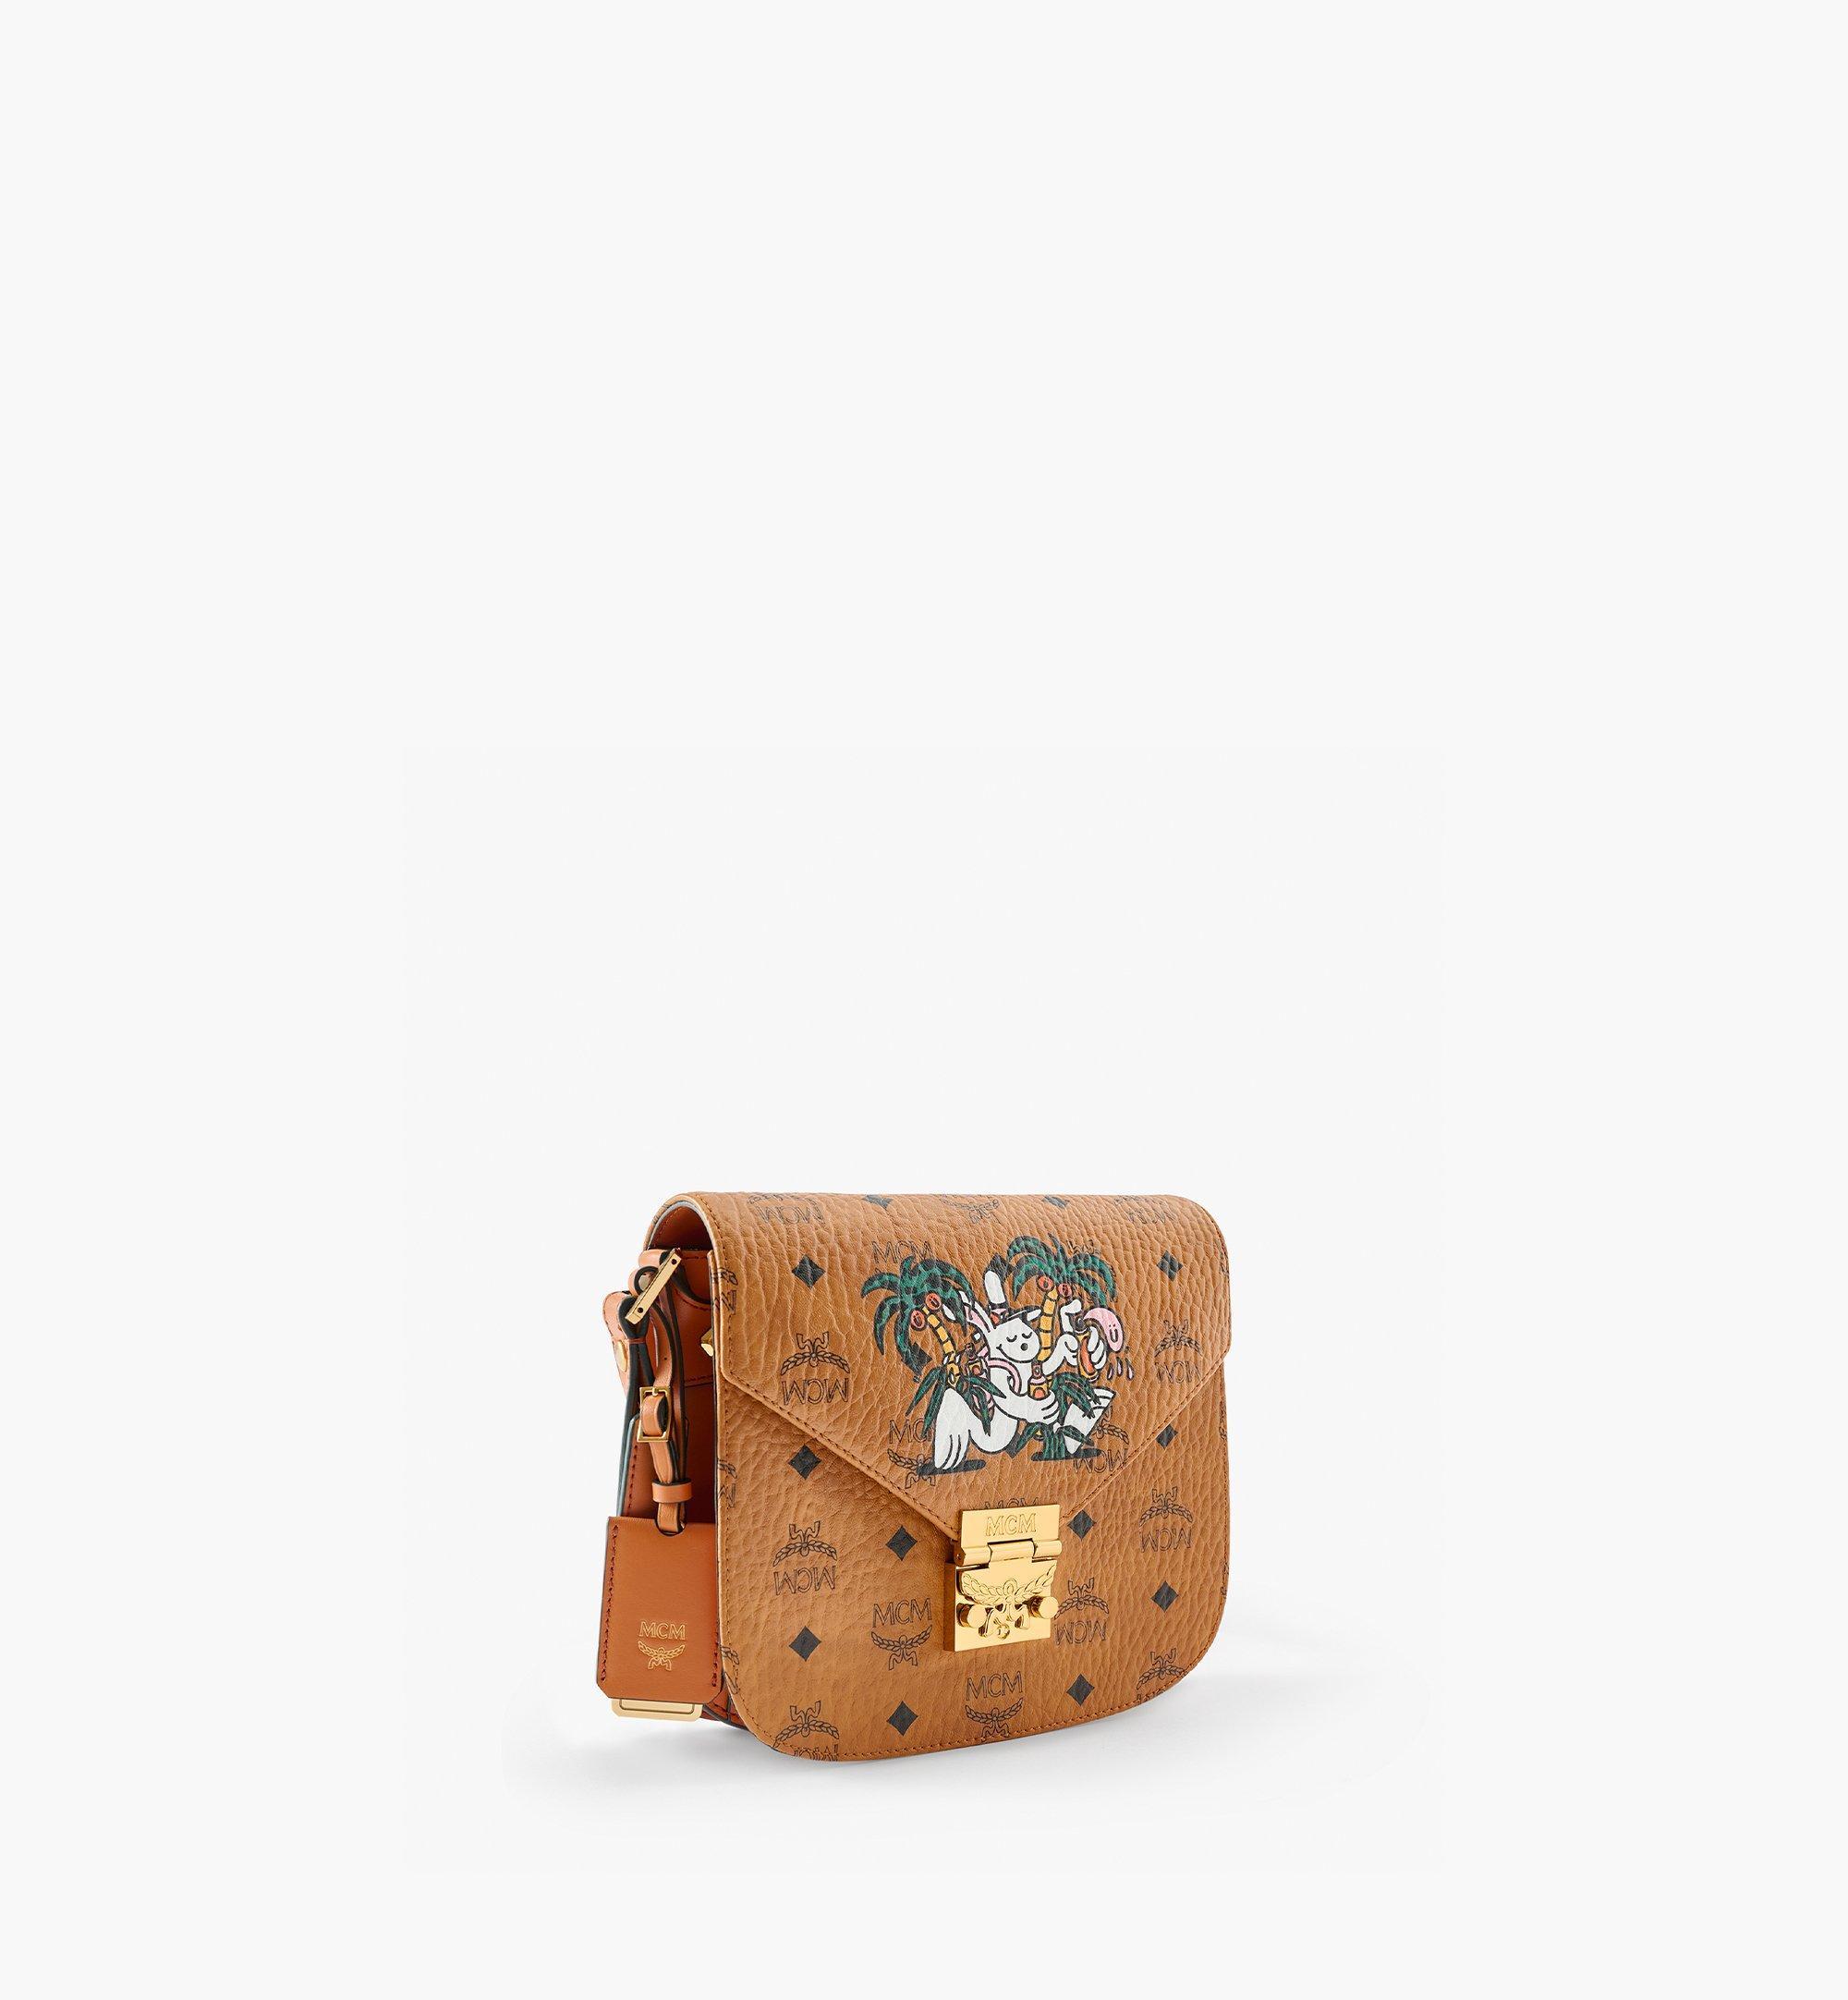 MCM MCM x Aka Boku Patricia Shoulder Bag in Visetos Cognac MWSBAUP01CO001 Alternate View 1